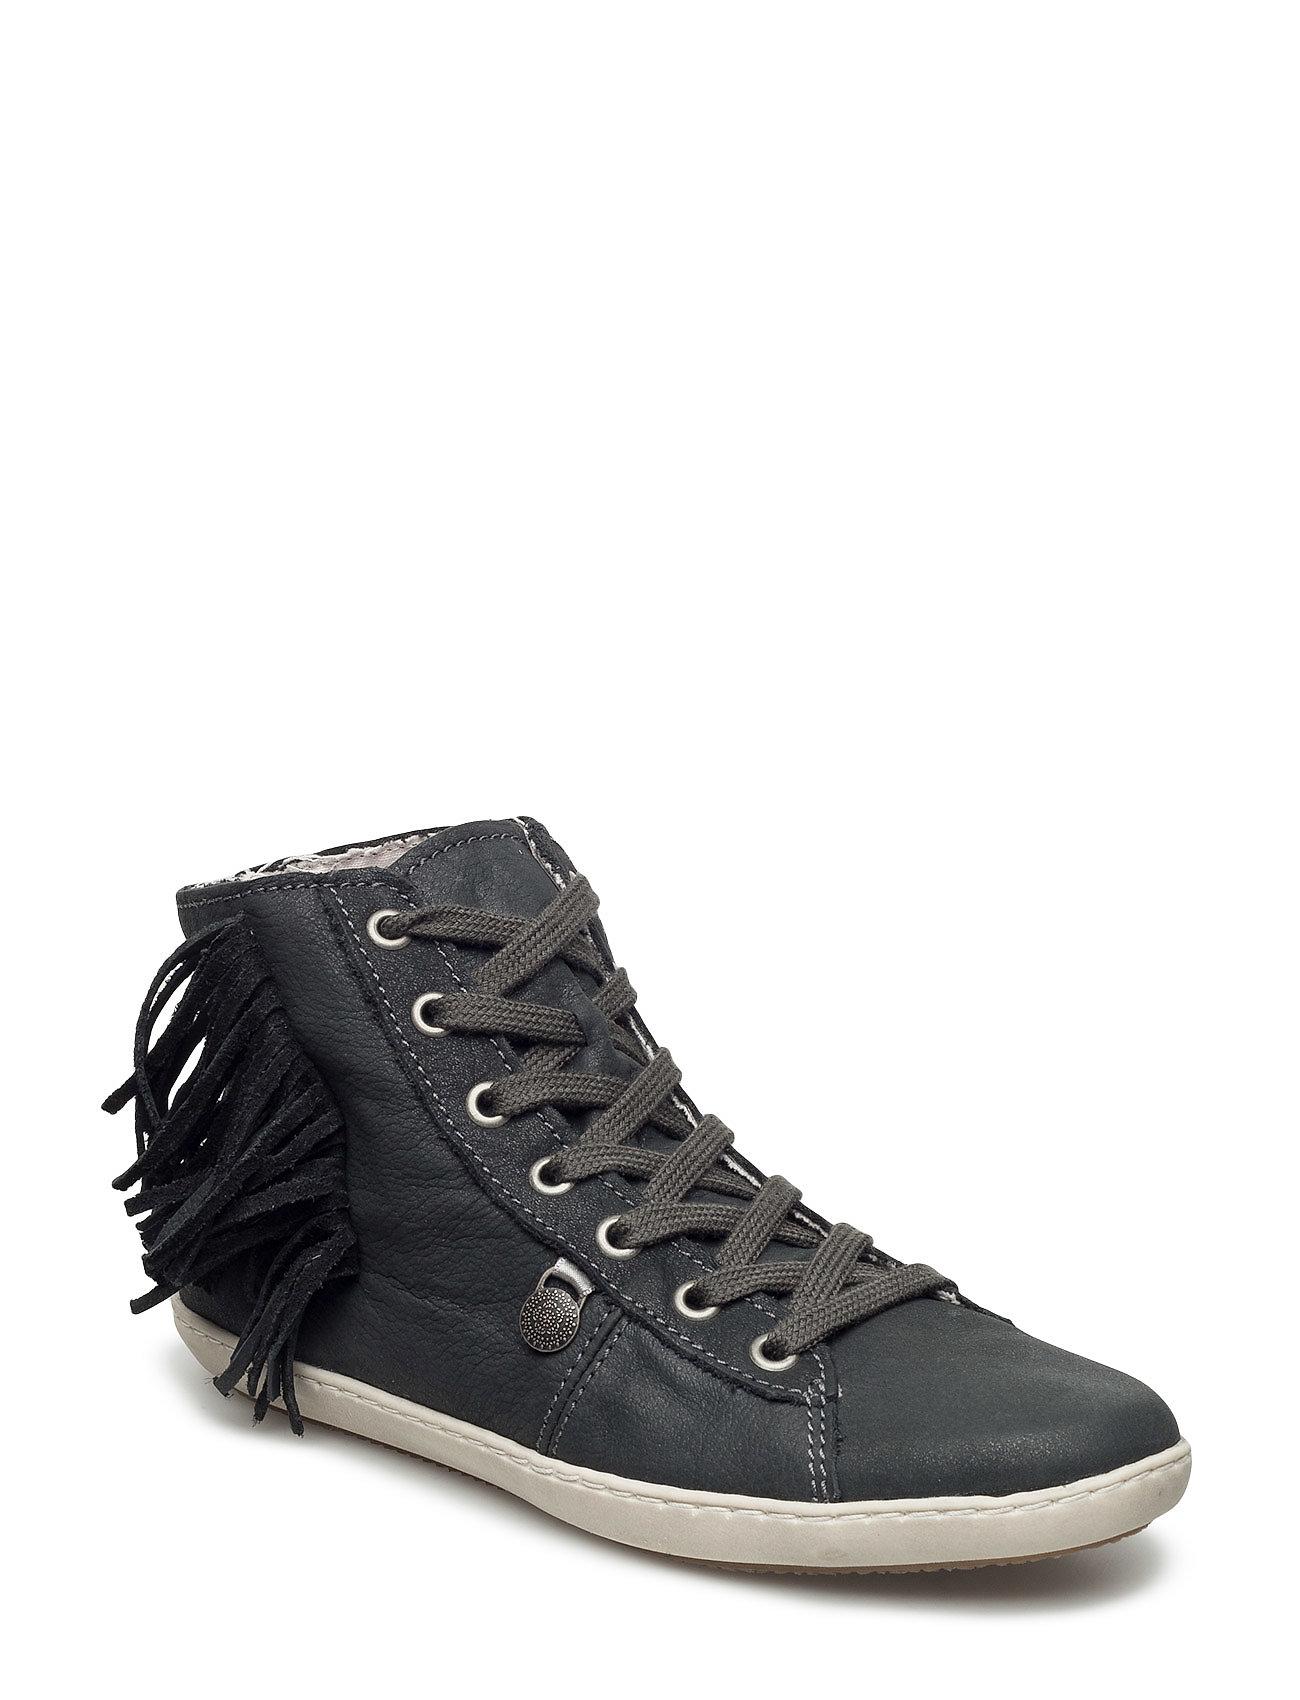 High Five High Sneakers ODD MOLLY Sneakers til Damer i Asfalt